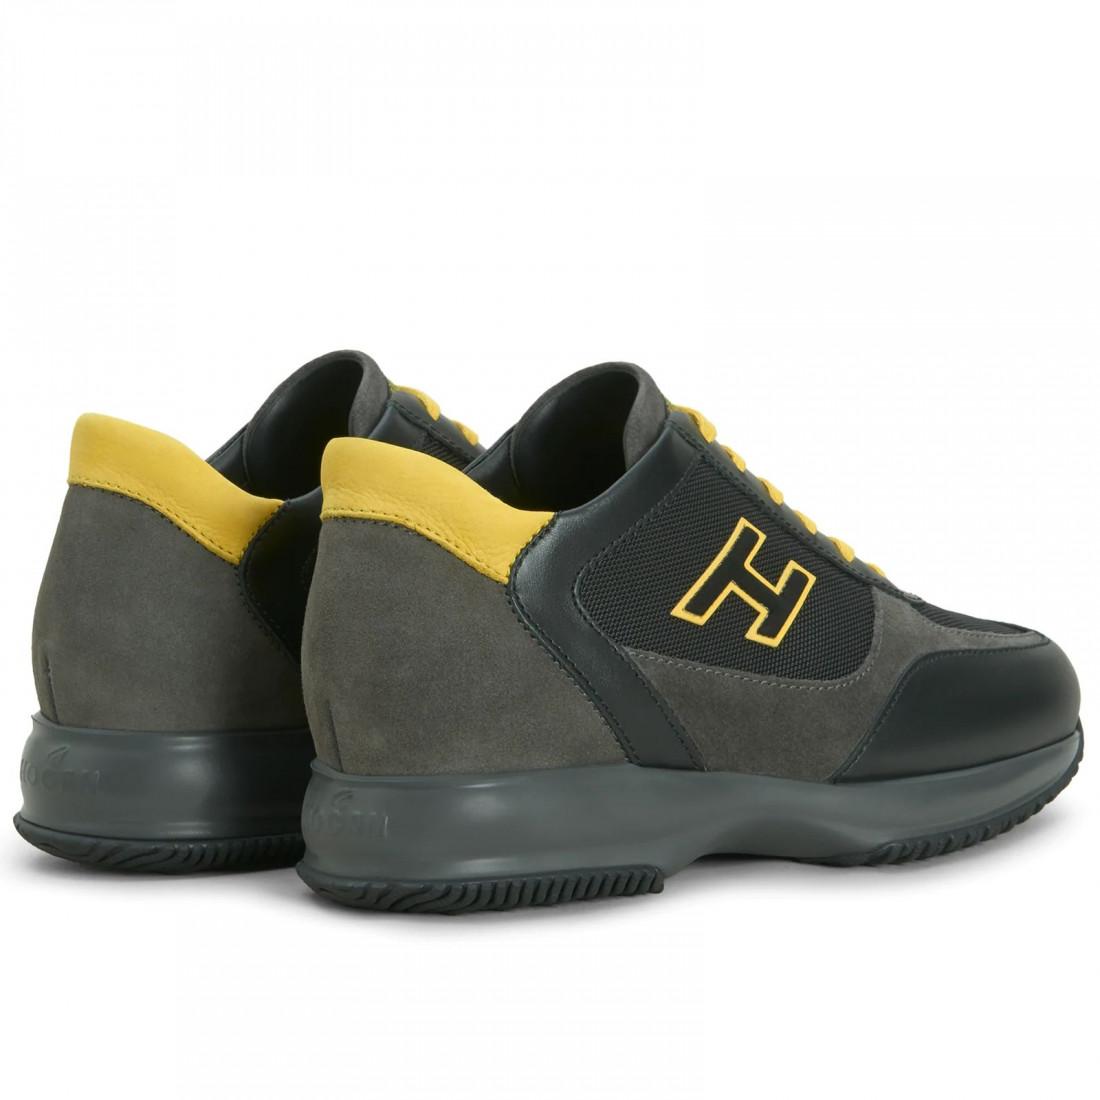 sneakers man hogan hxm00n0q101o8m50bj 7409